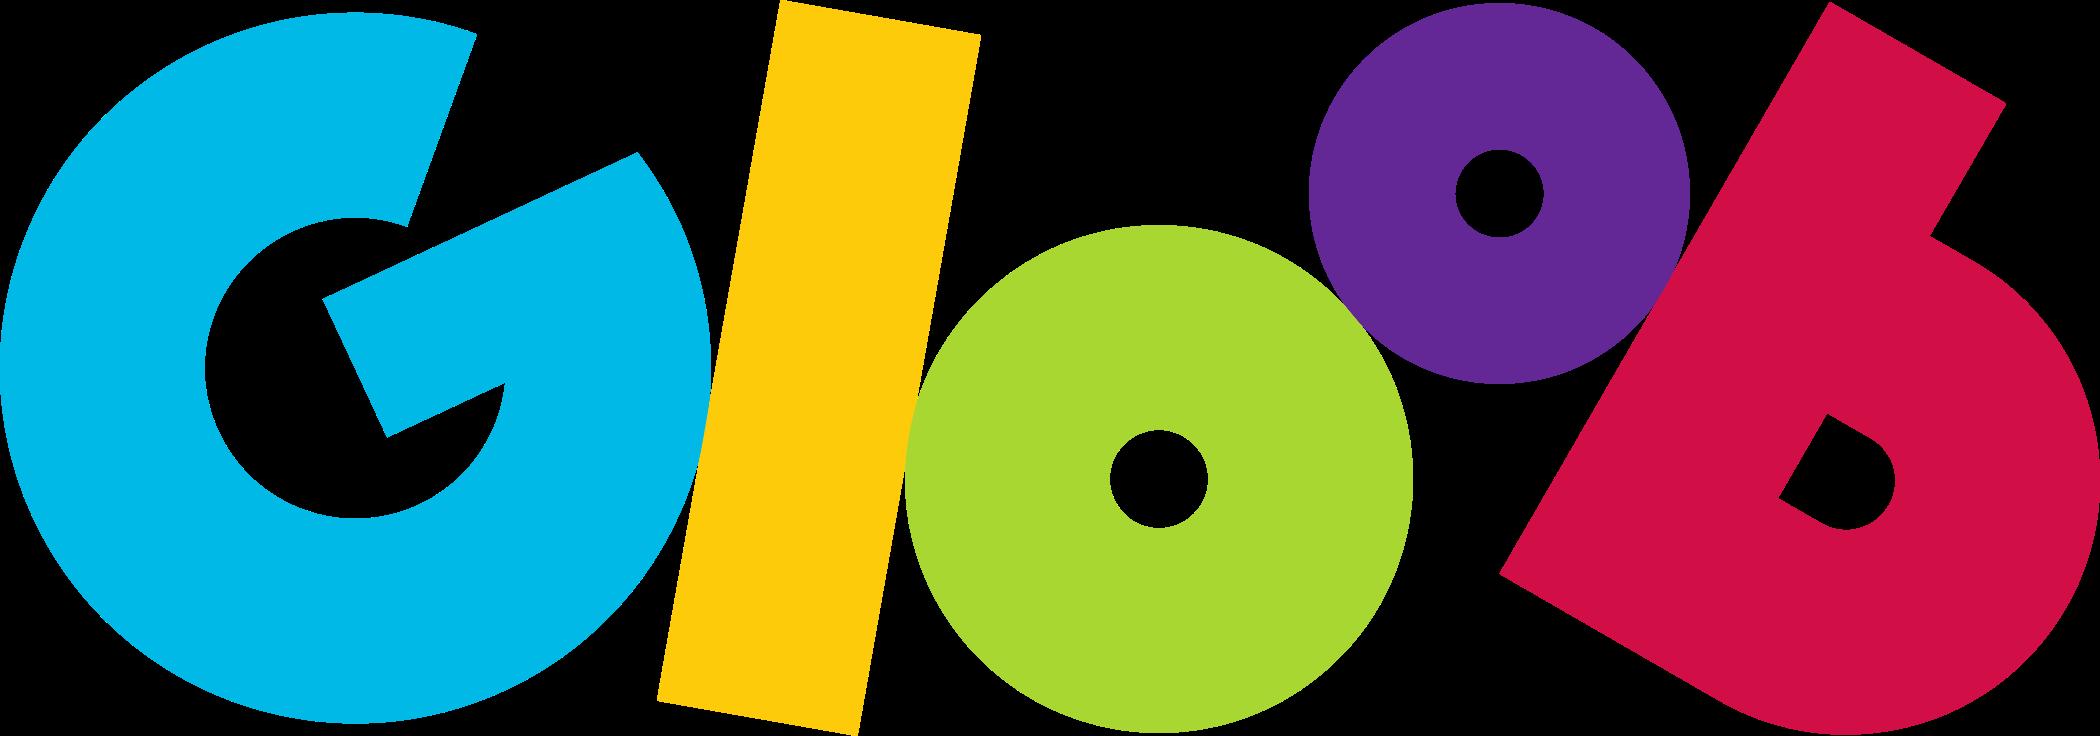 Canal Gloob Logo.